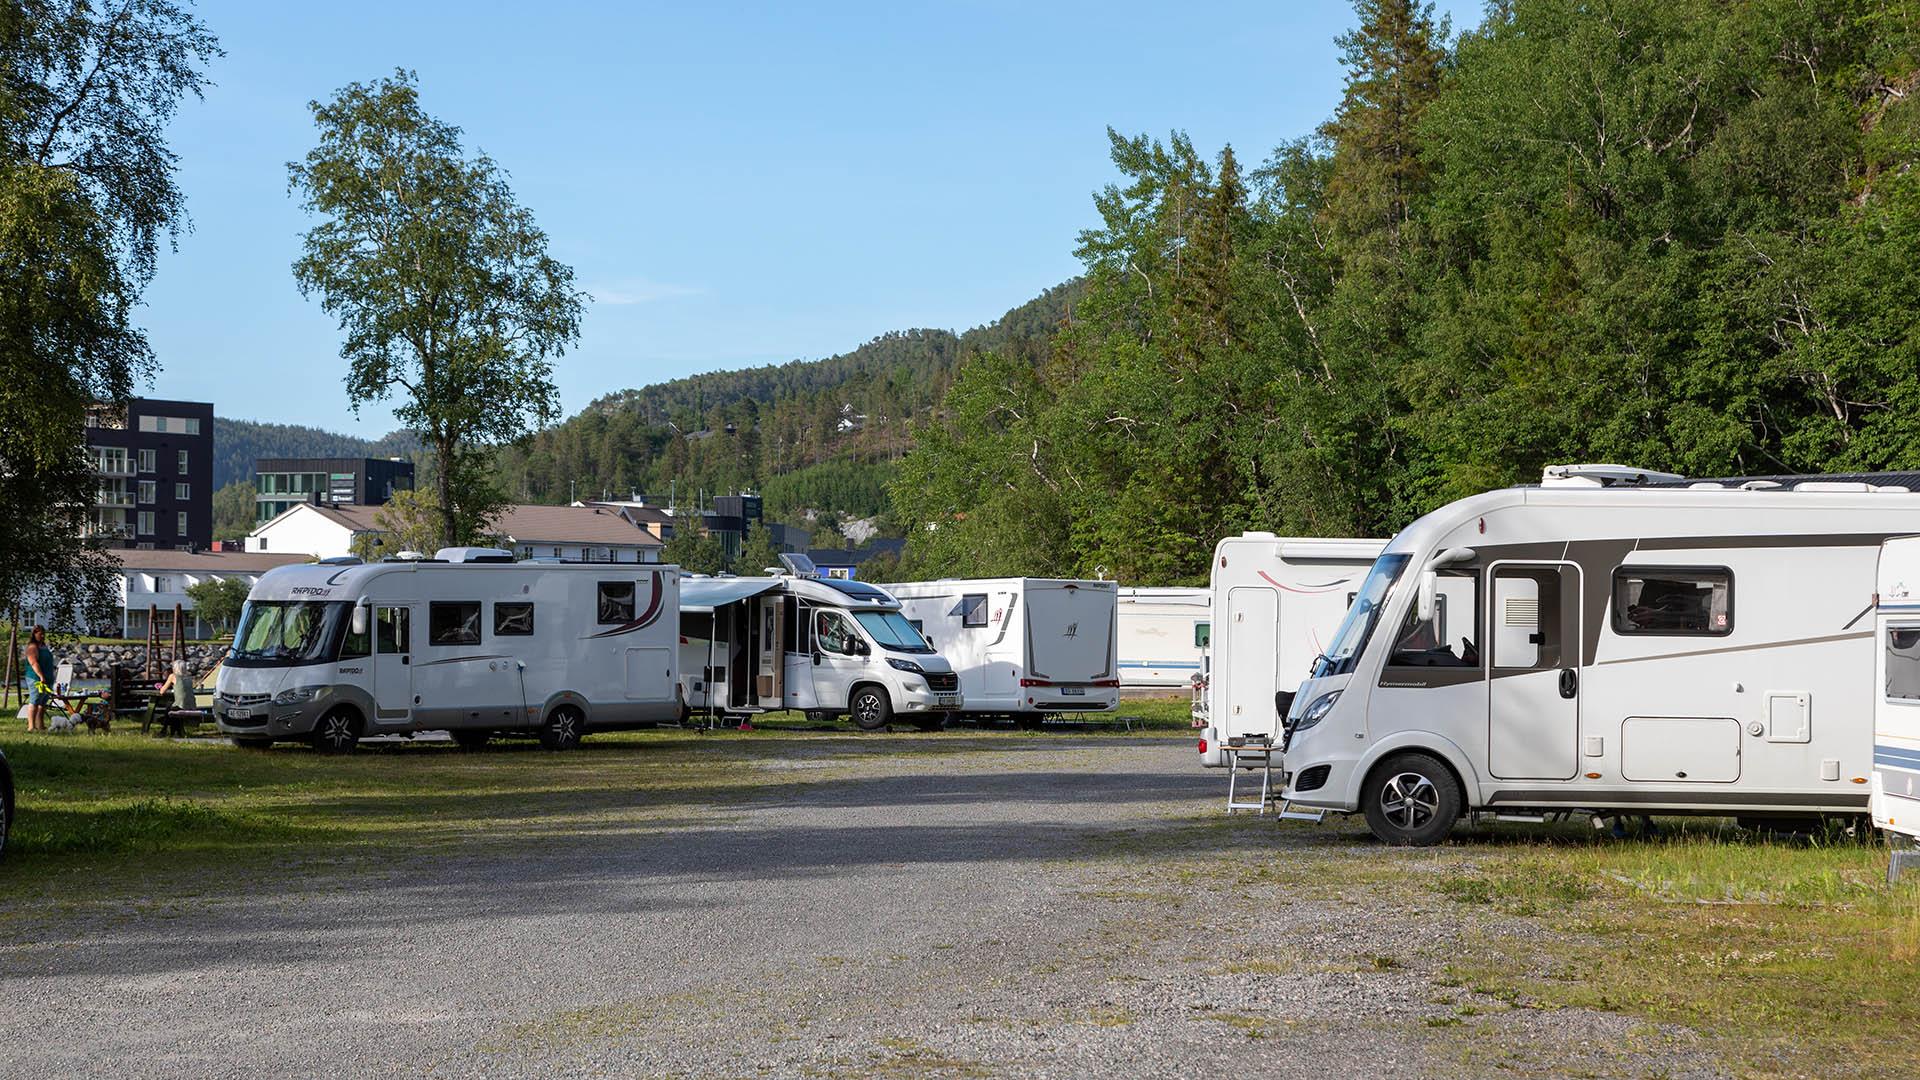 Åfjord Laksecamping, Åfjord, Trøndelag